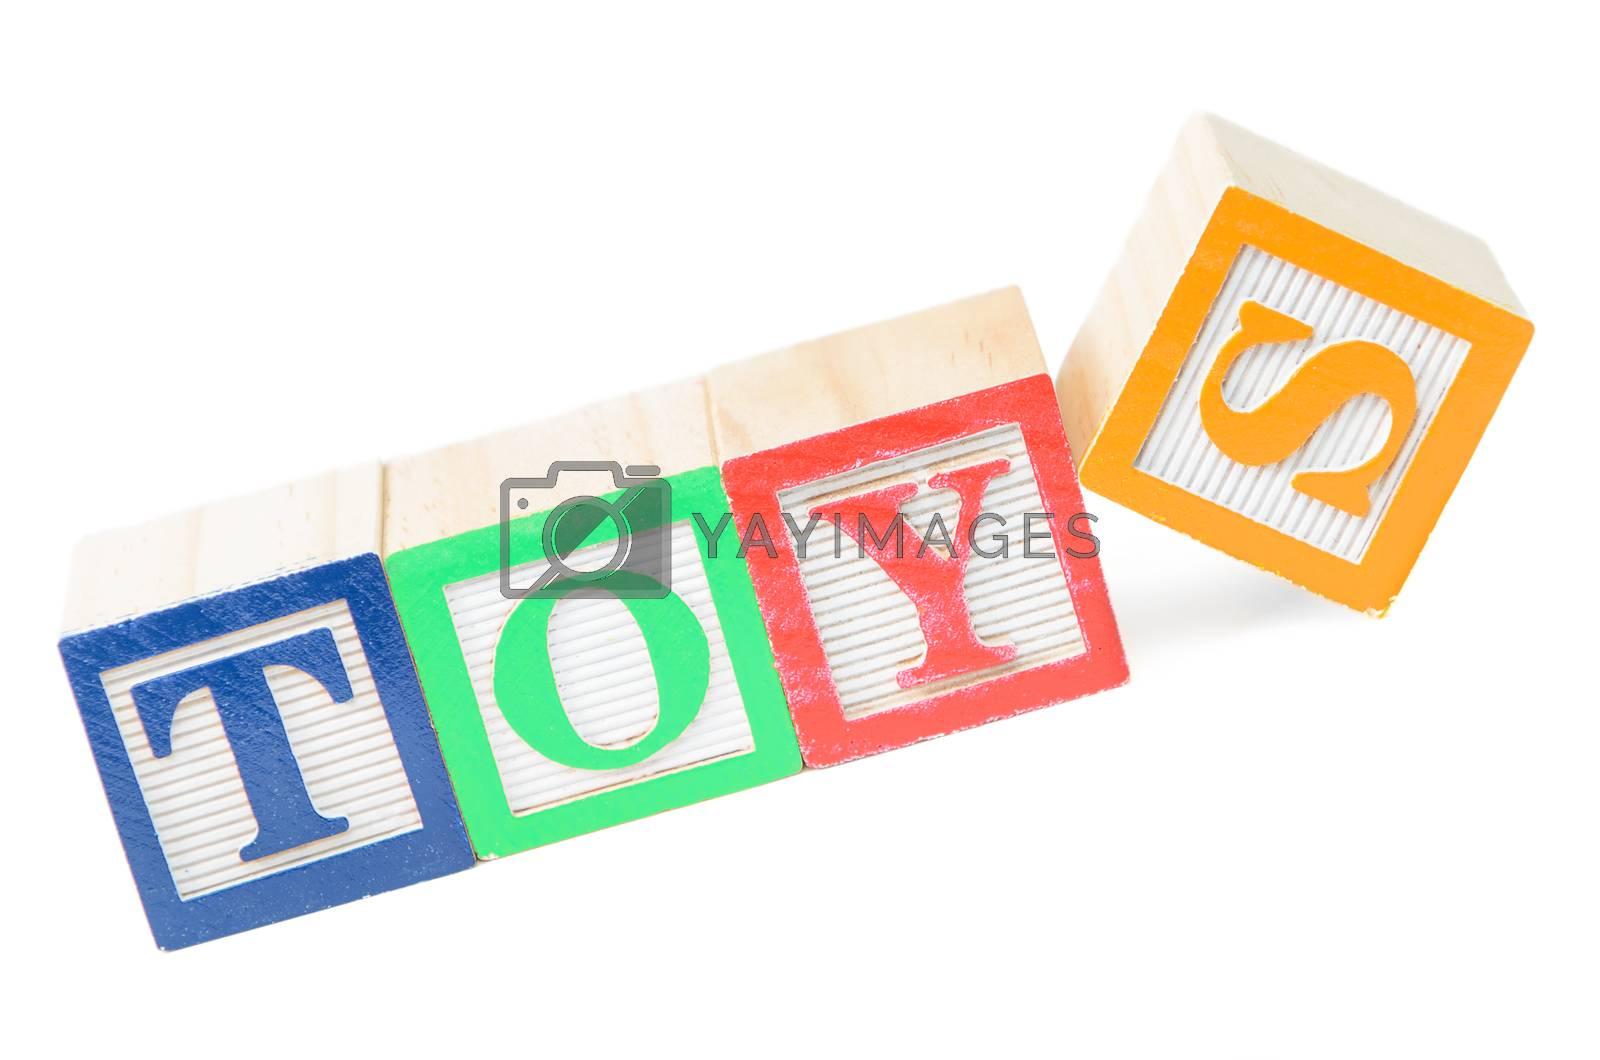 Baby blocks spelling toys. Isolated on white background